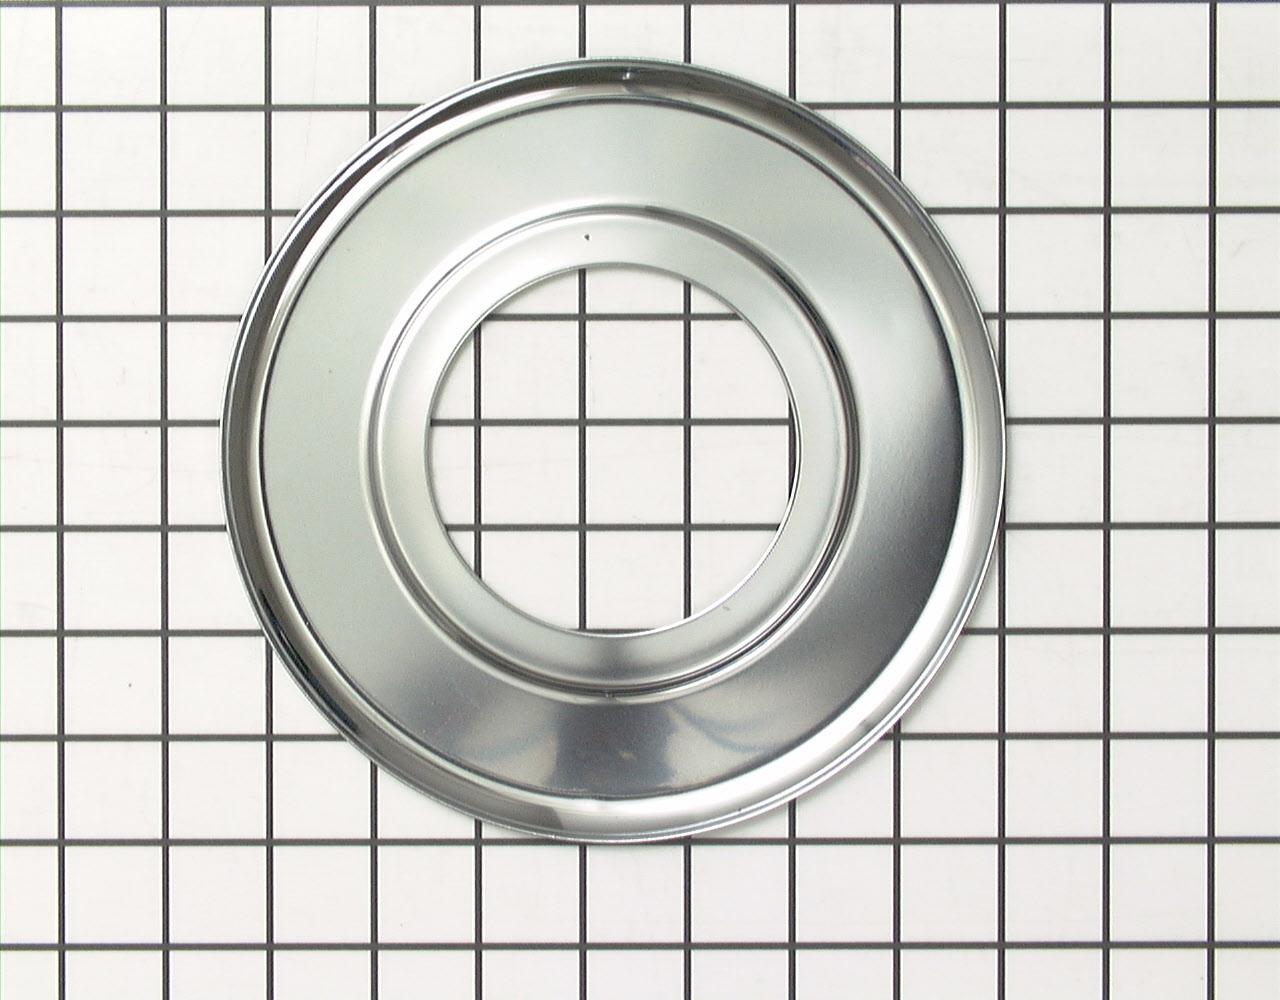 Roper Range/Stove/Oven Part # 322888 - Burner Drip Pan